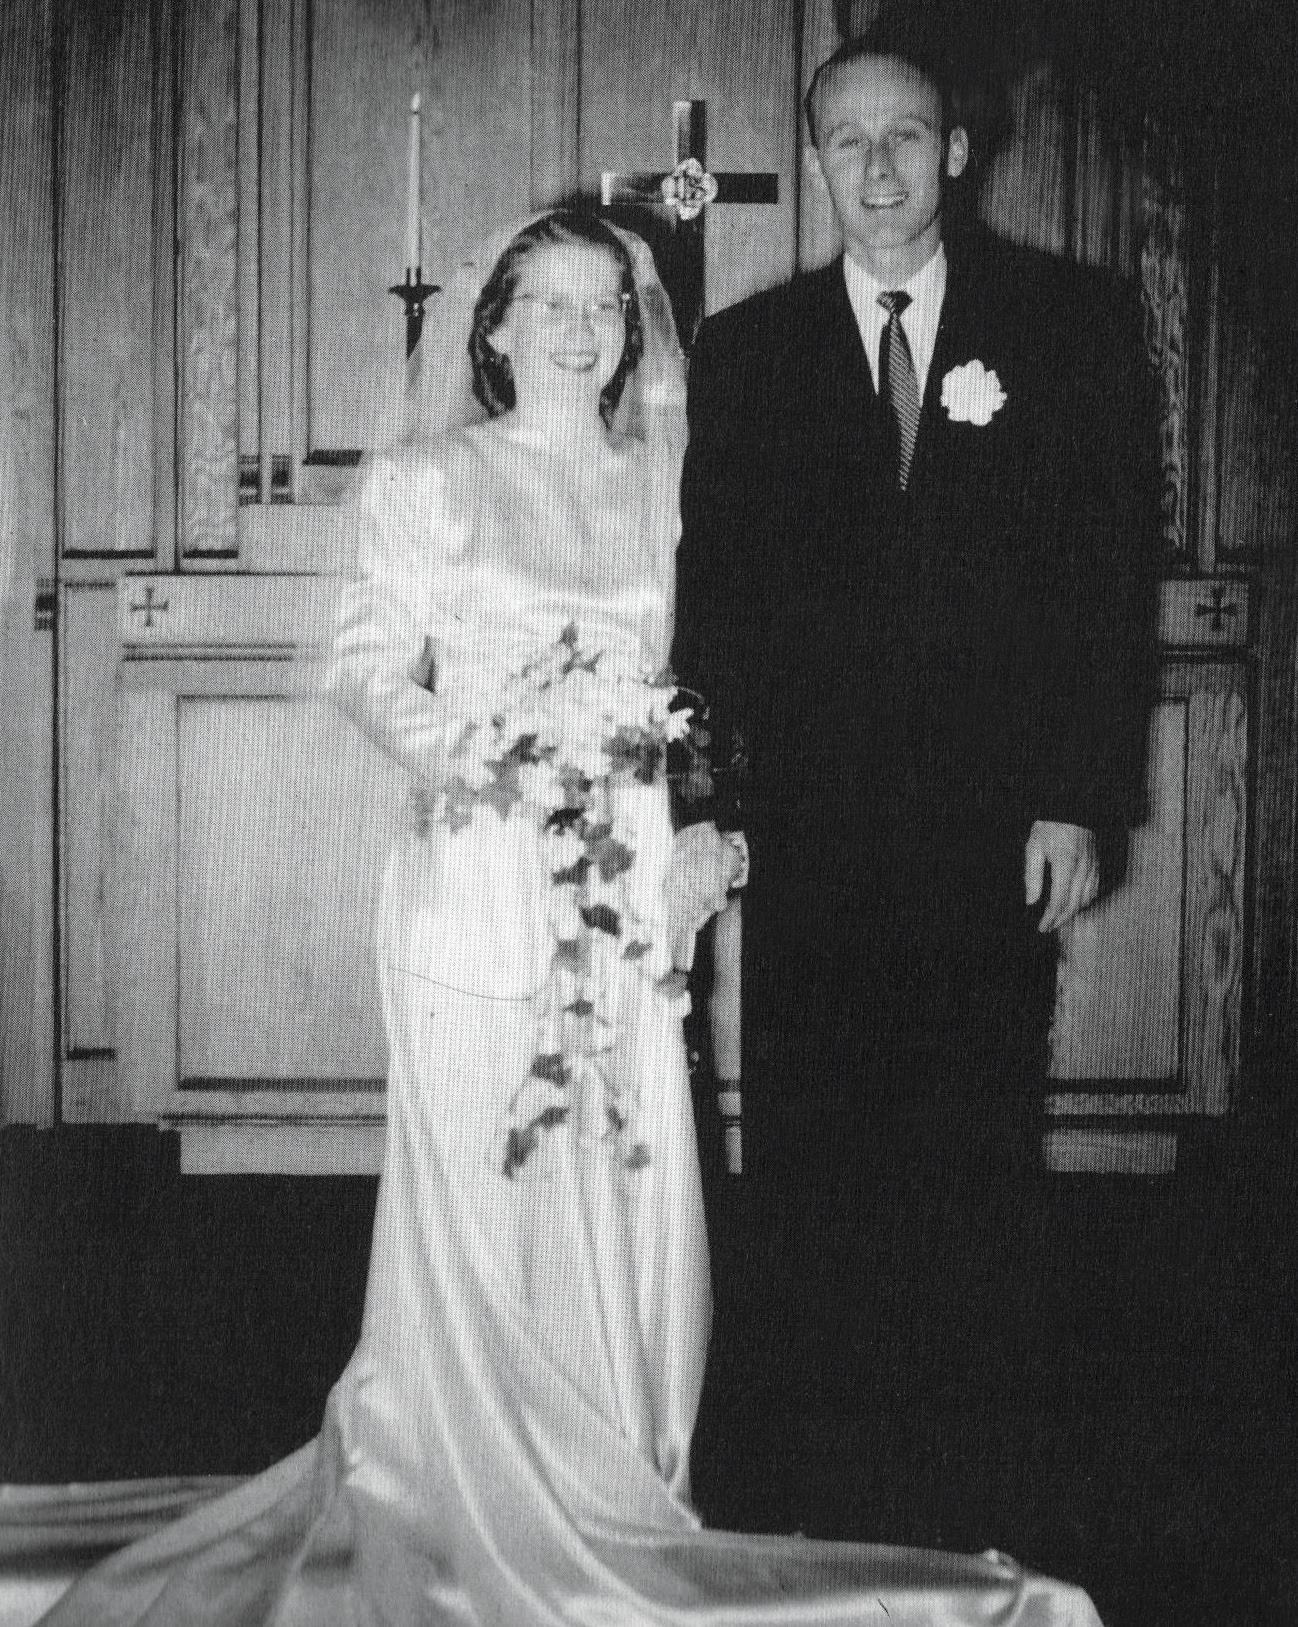 Audrey and Wilbur Veath Wedding photo